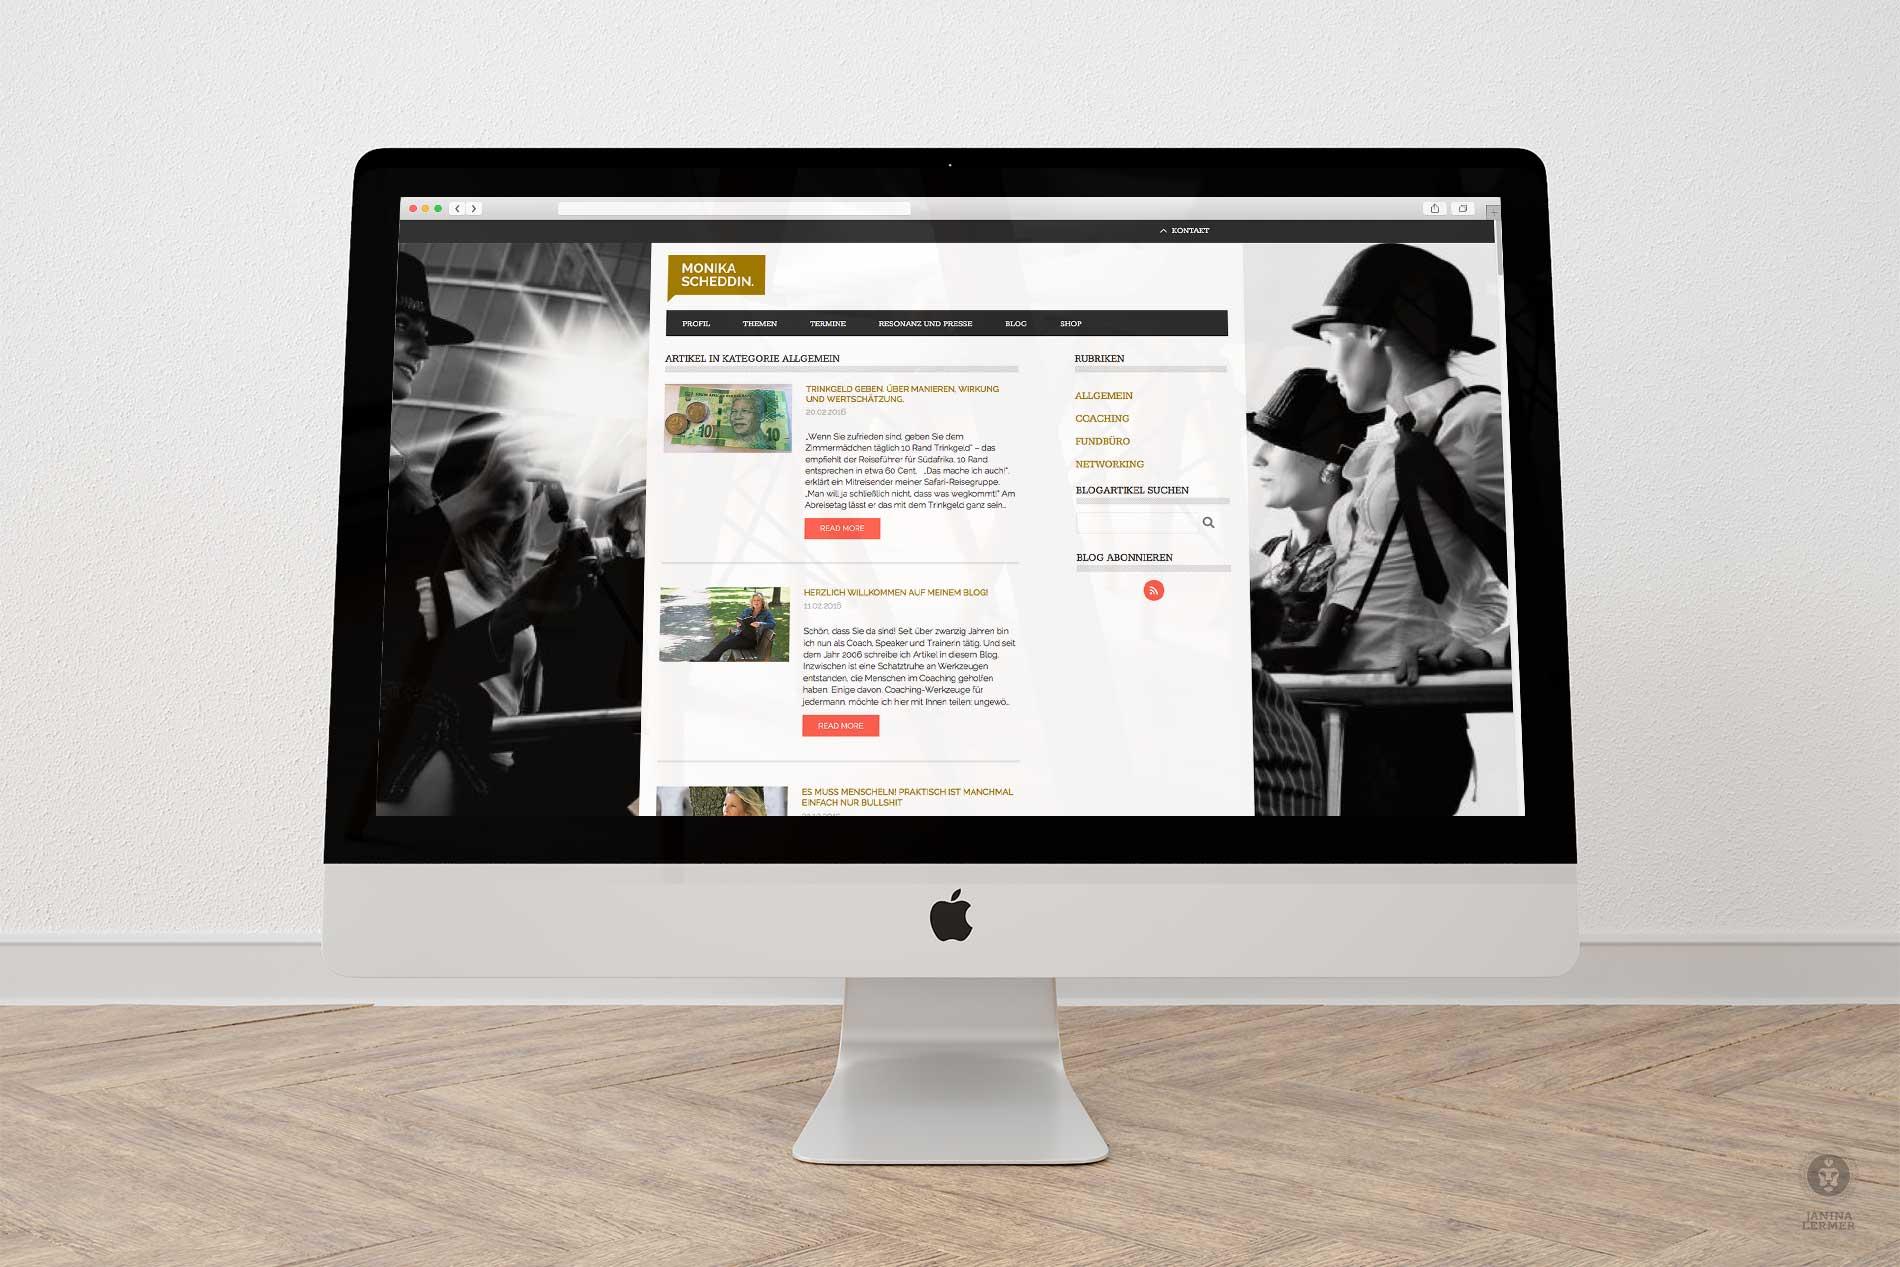 Janina-Lermer-Webseitengestaltung-Webdesign-Blog-Coach-Monika-Scheddin